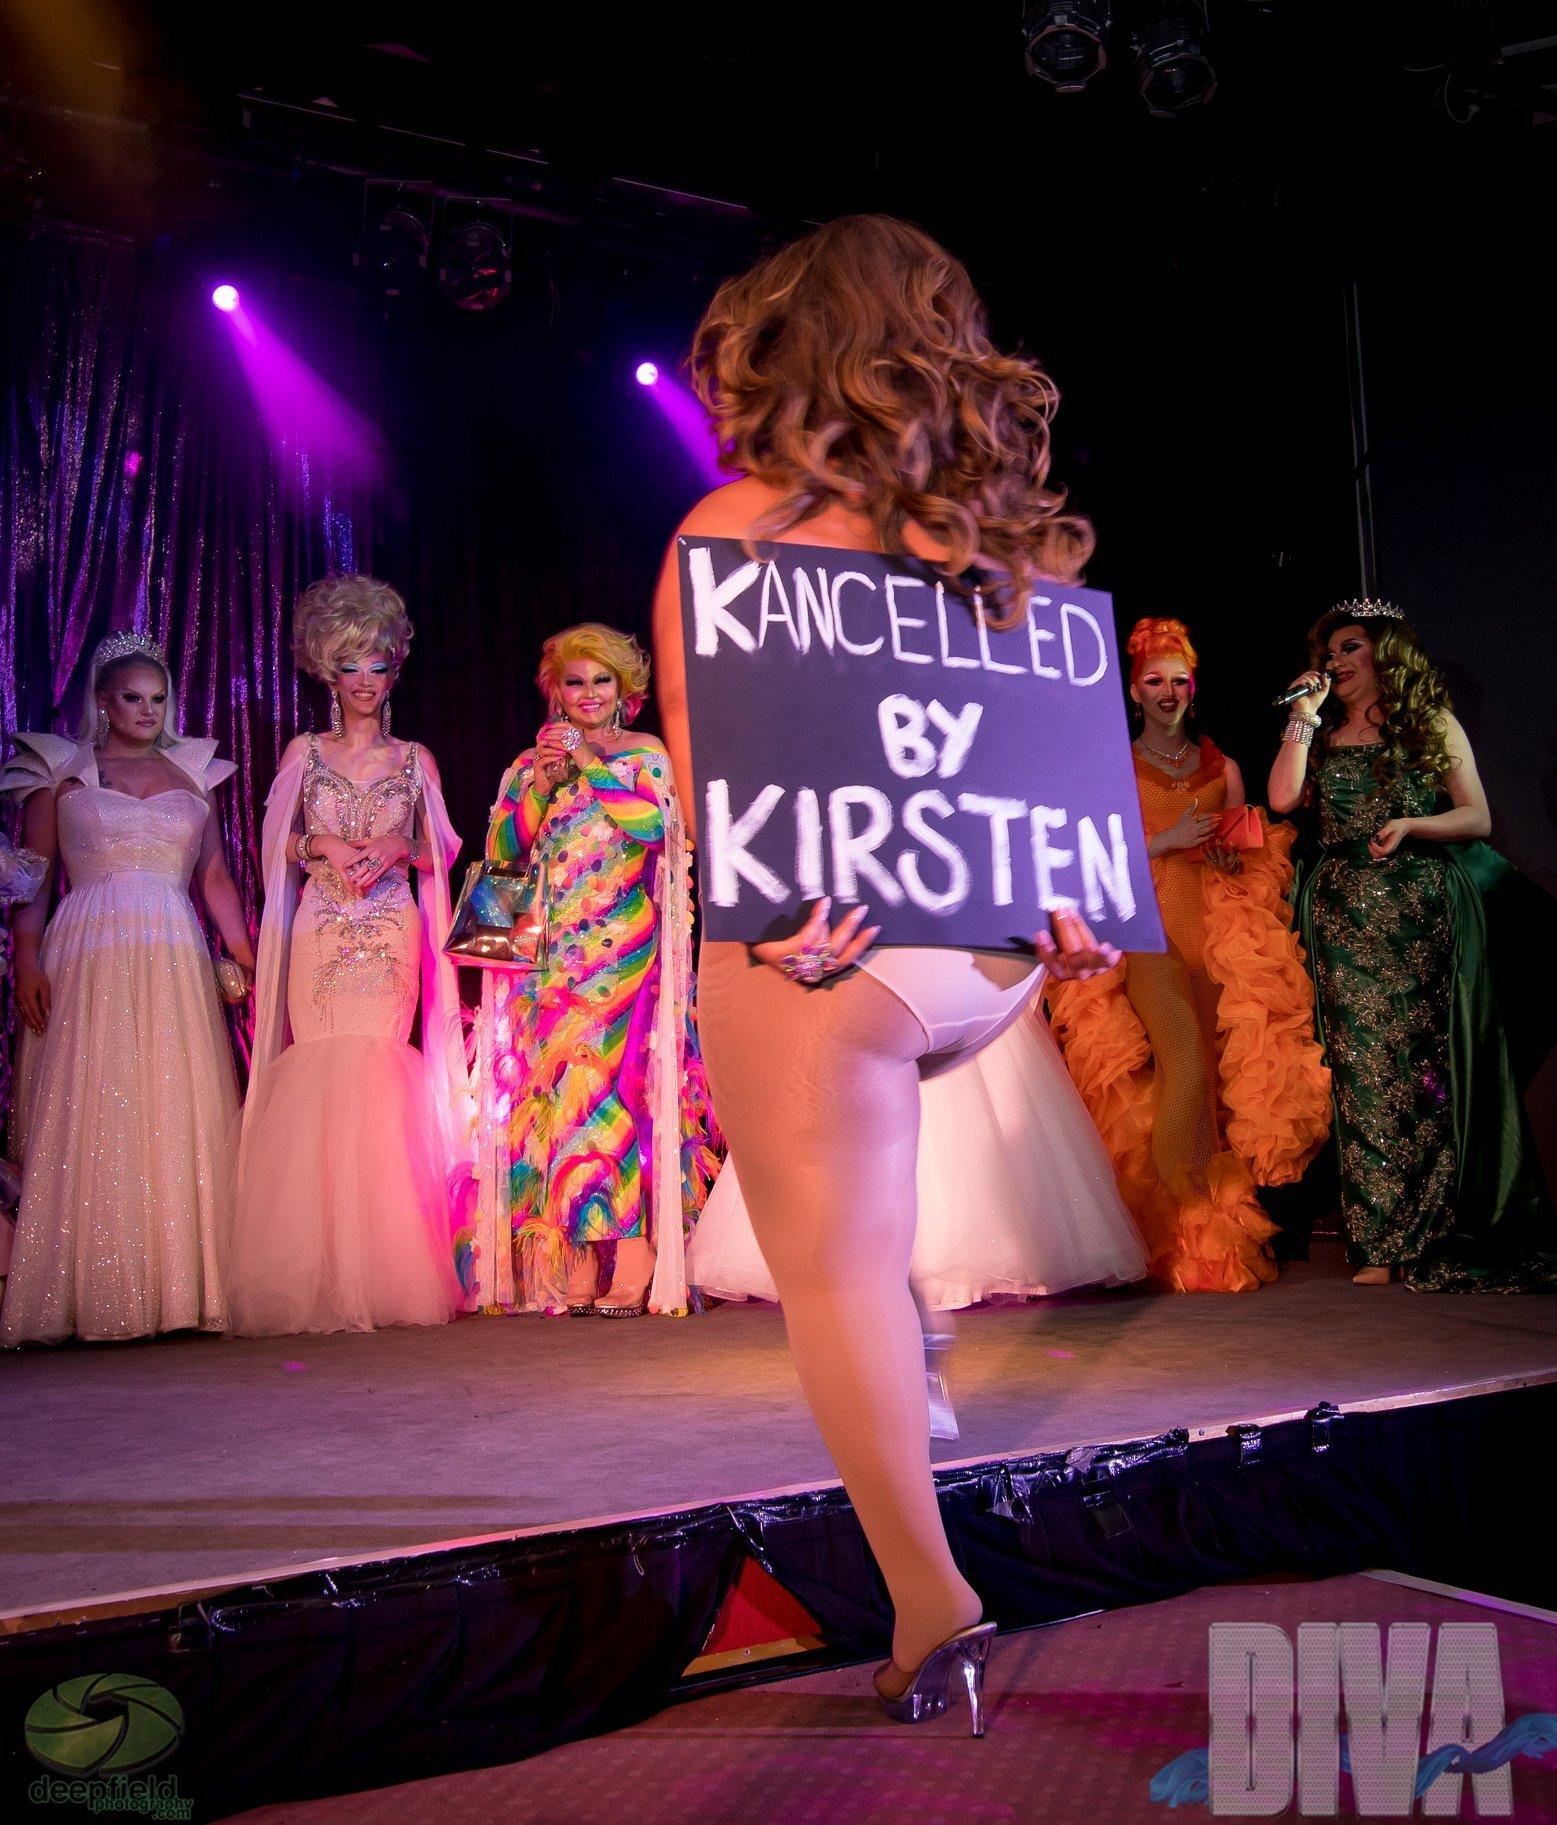 bell-of-the-coco-jumbo-diva-awards-sydney-drag-queen-royalty-best-hire-drag-race-australia-1.jpg